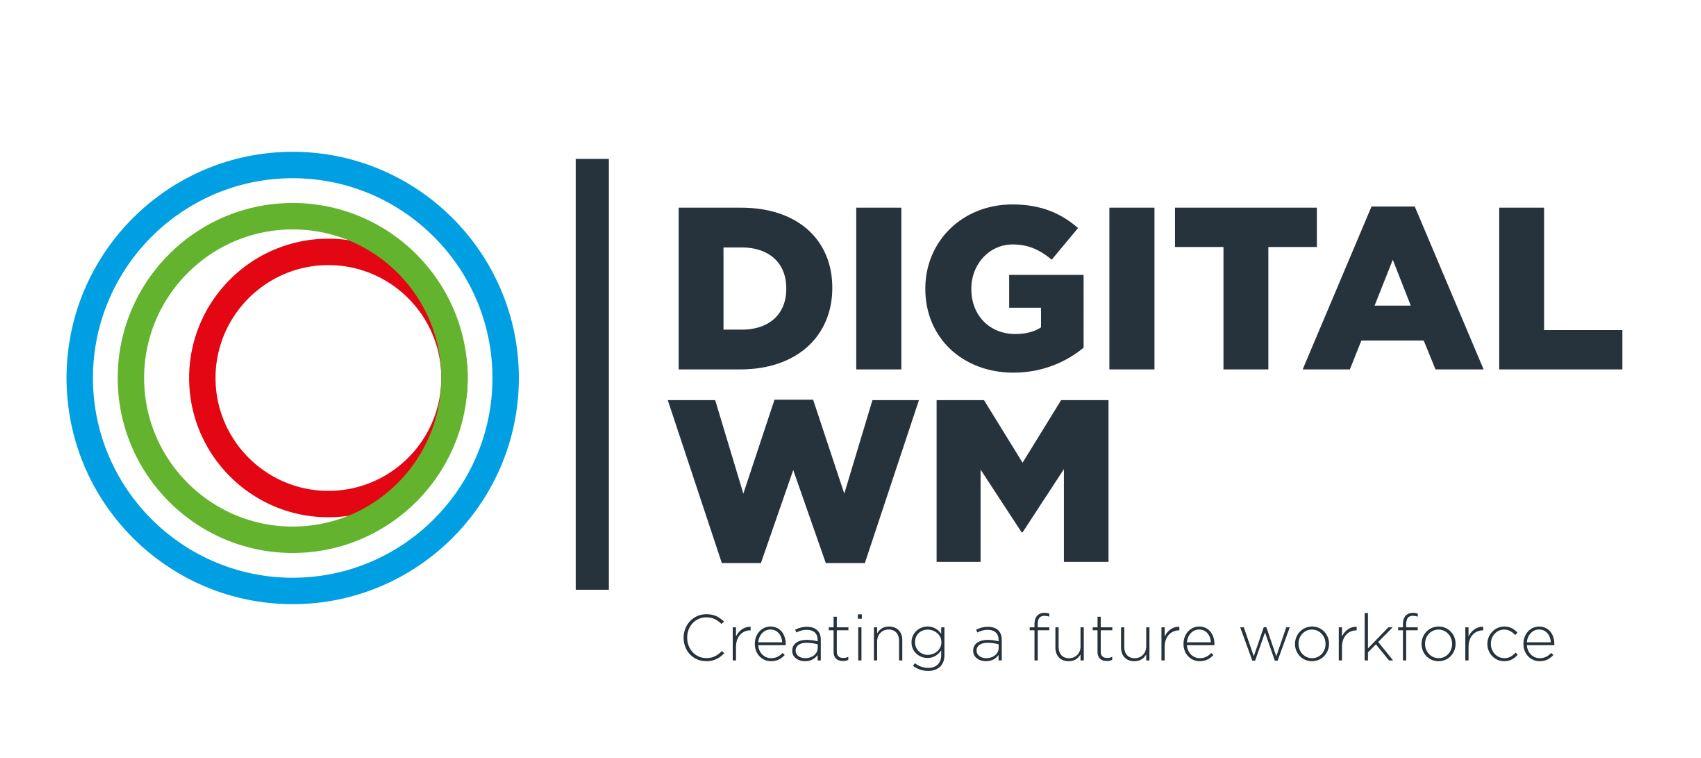 New joint venture set to deliver digital skills for the West Midlands